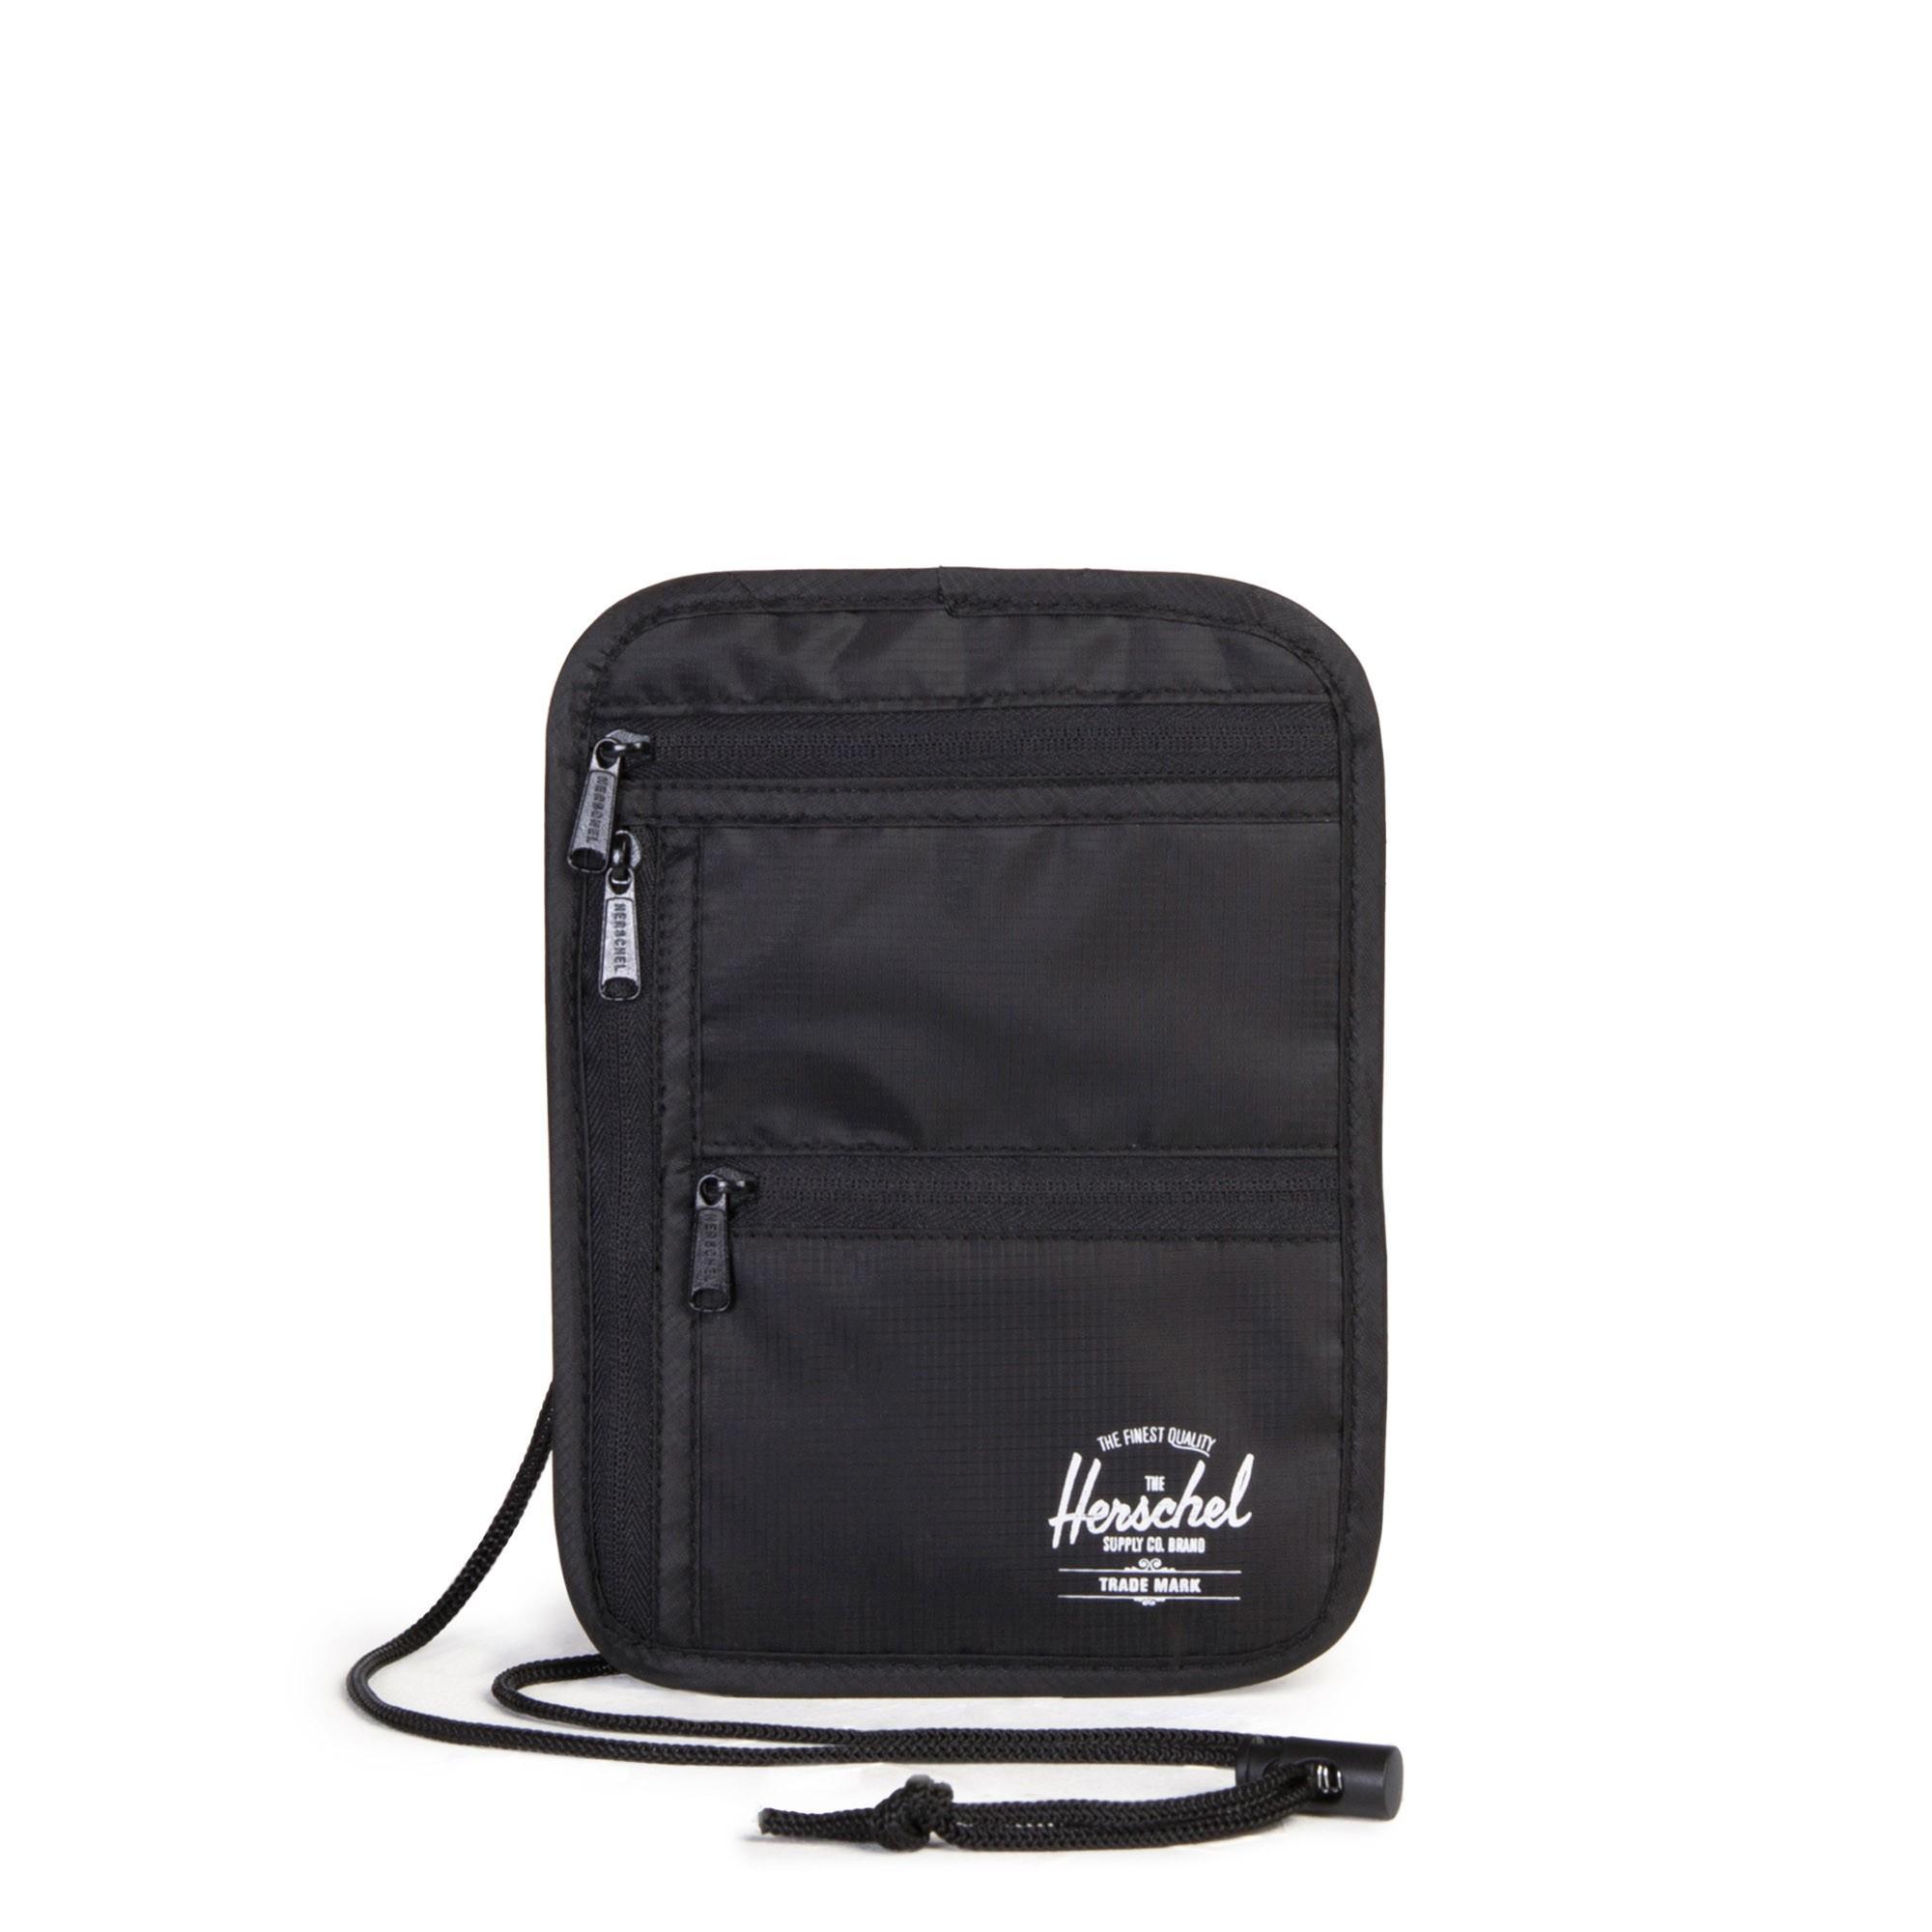 7d482fa4a457 Buy Herschel Supply Co